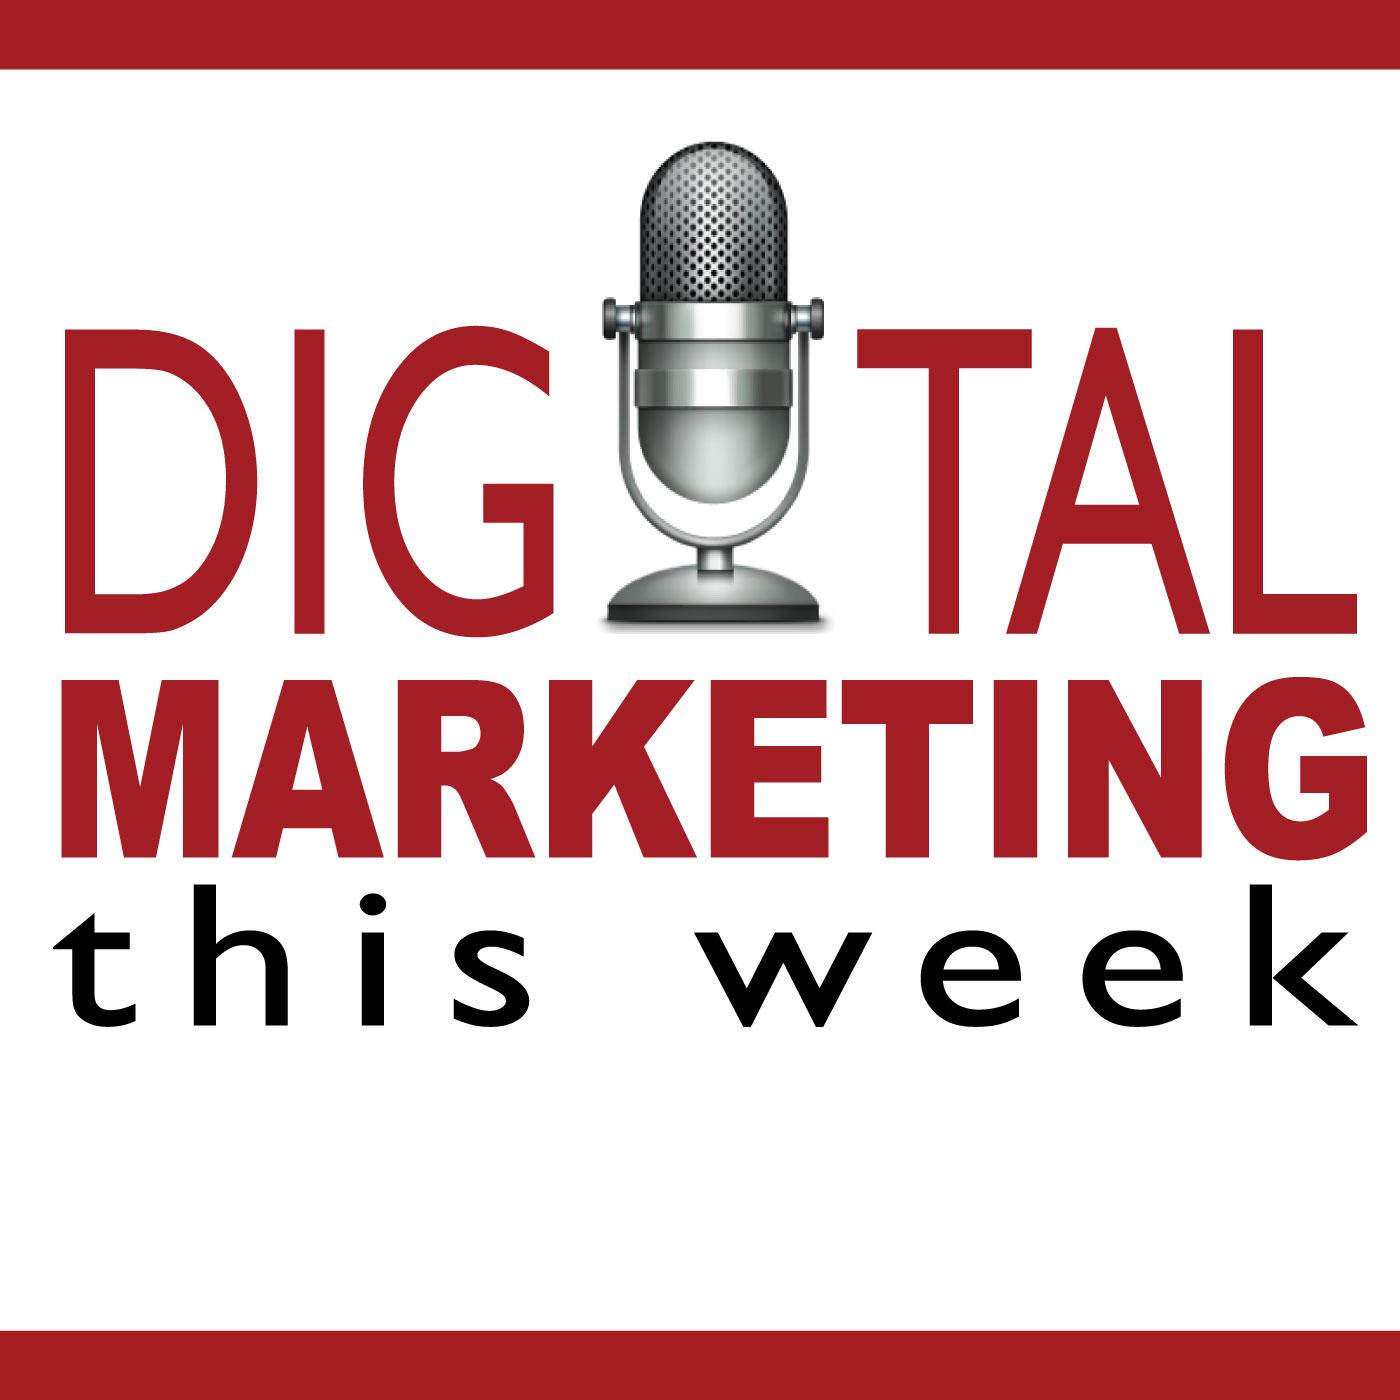 Digital Marketing This Week - Analytics, Conversions, and Internet Marketing (DMTW)